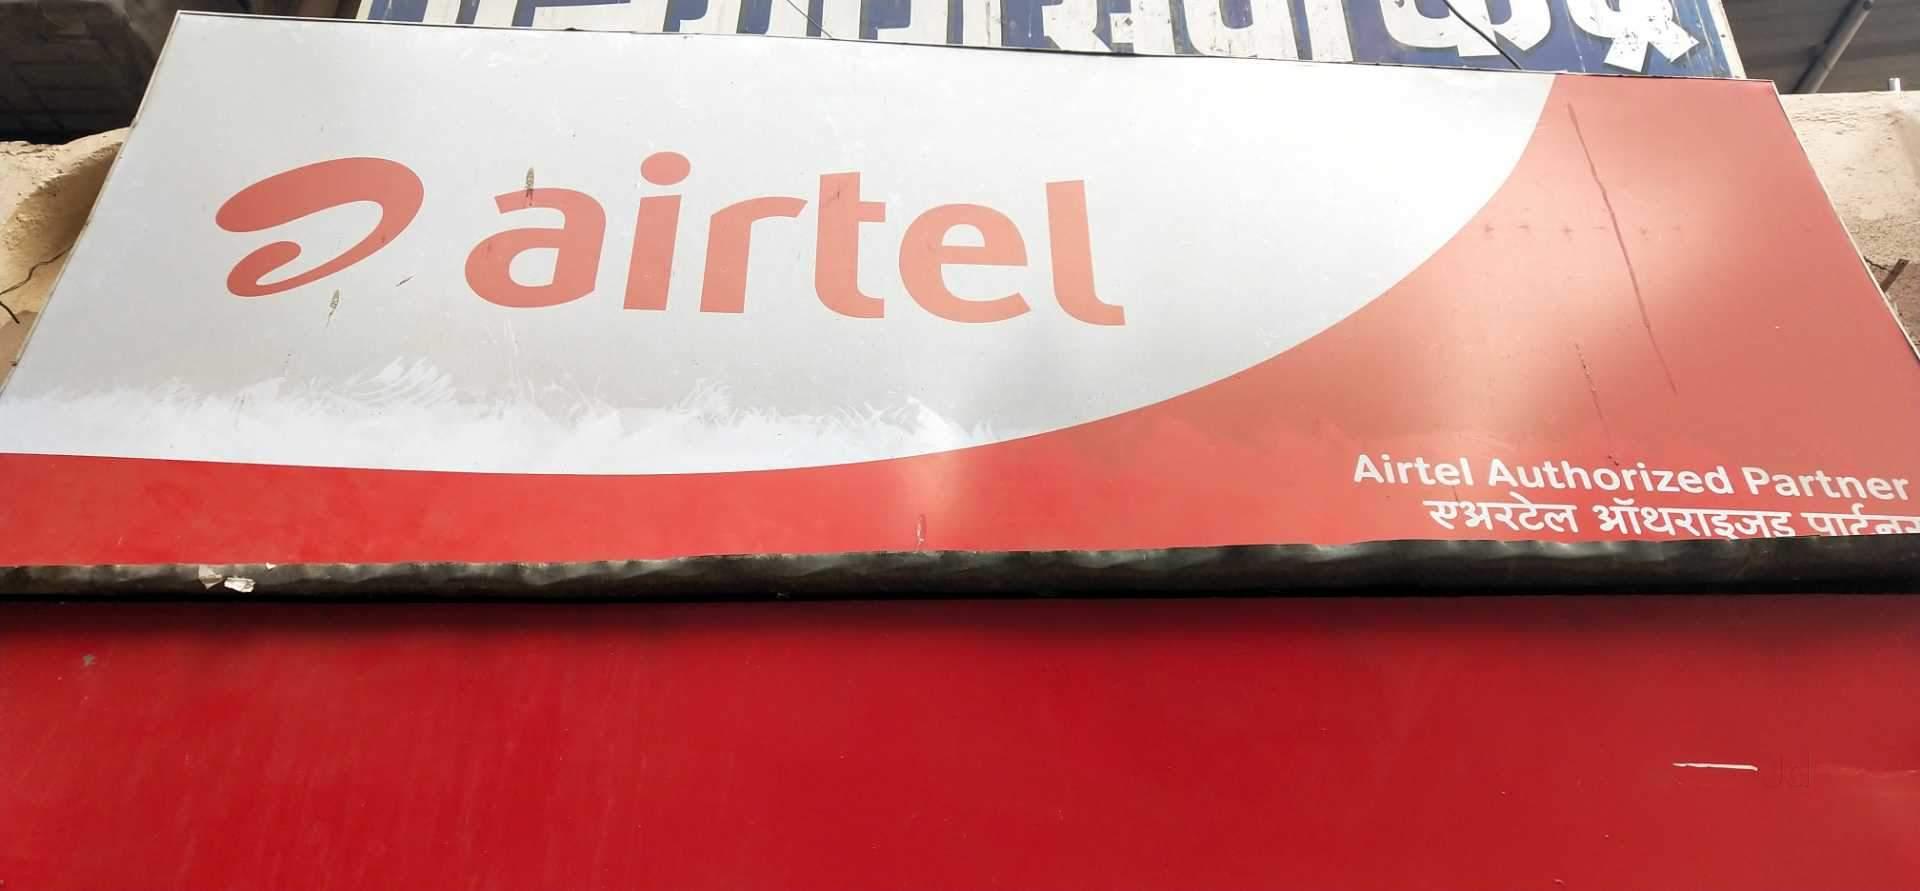 Top 100 Airtel Wifi Internet Service Providers in Mumbai